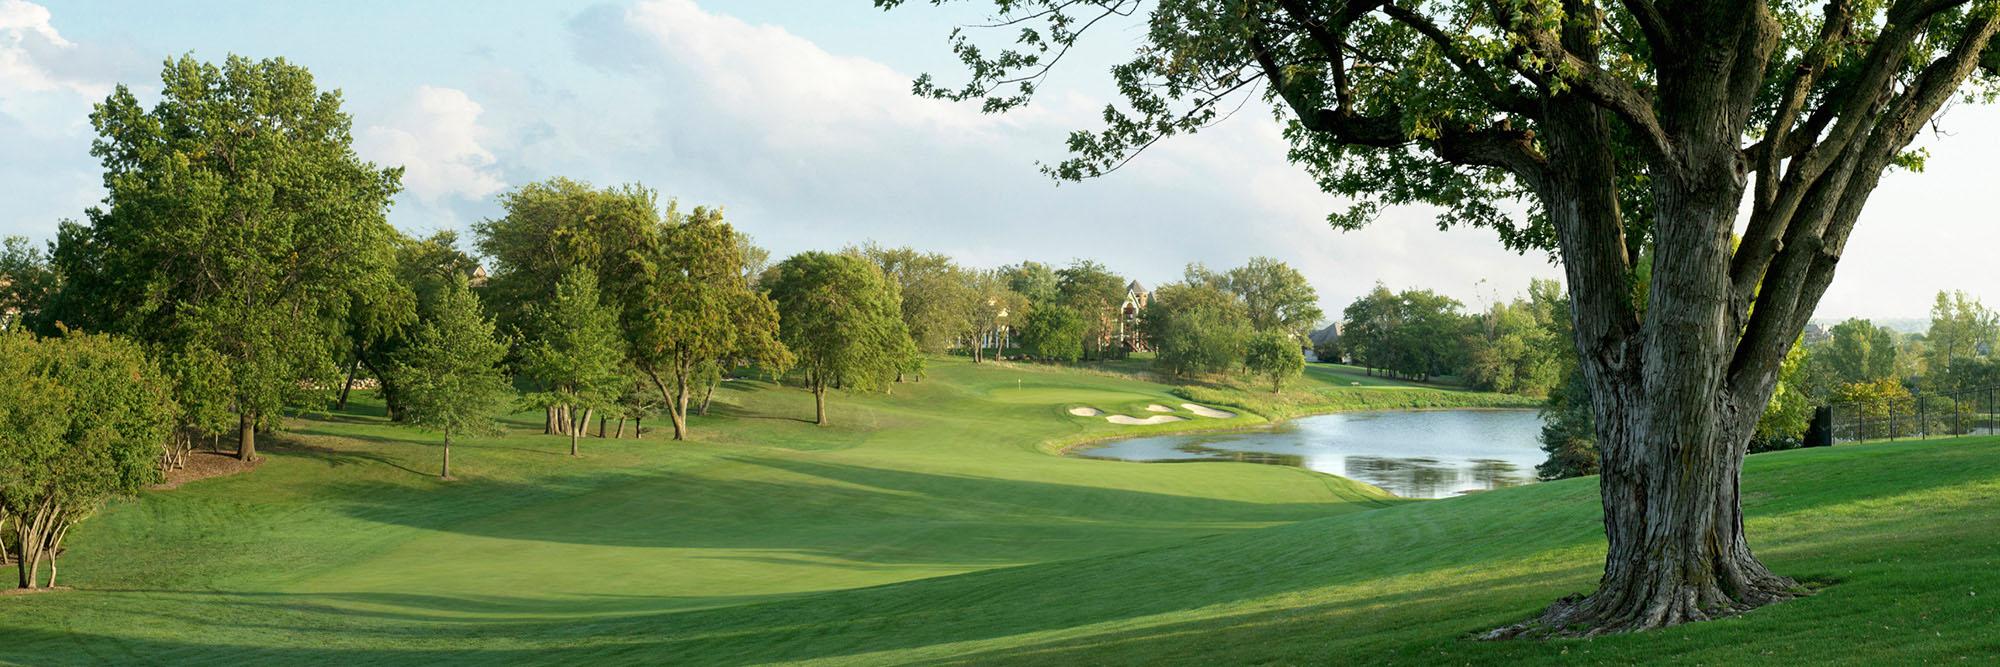 Golf Course Image - Glen Oaks No. 13